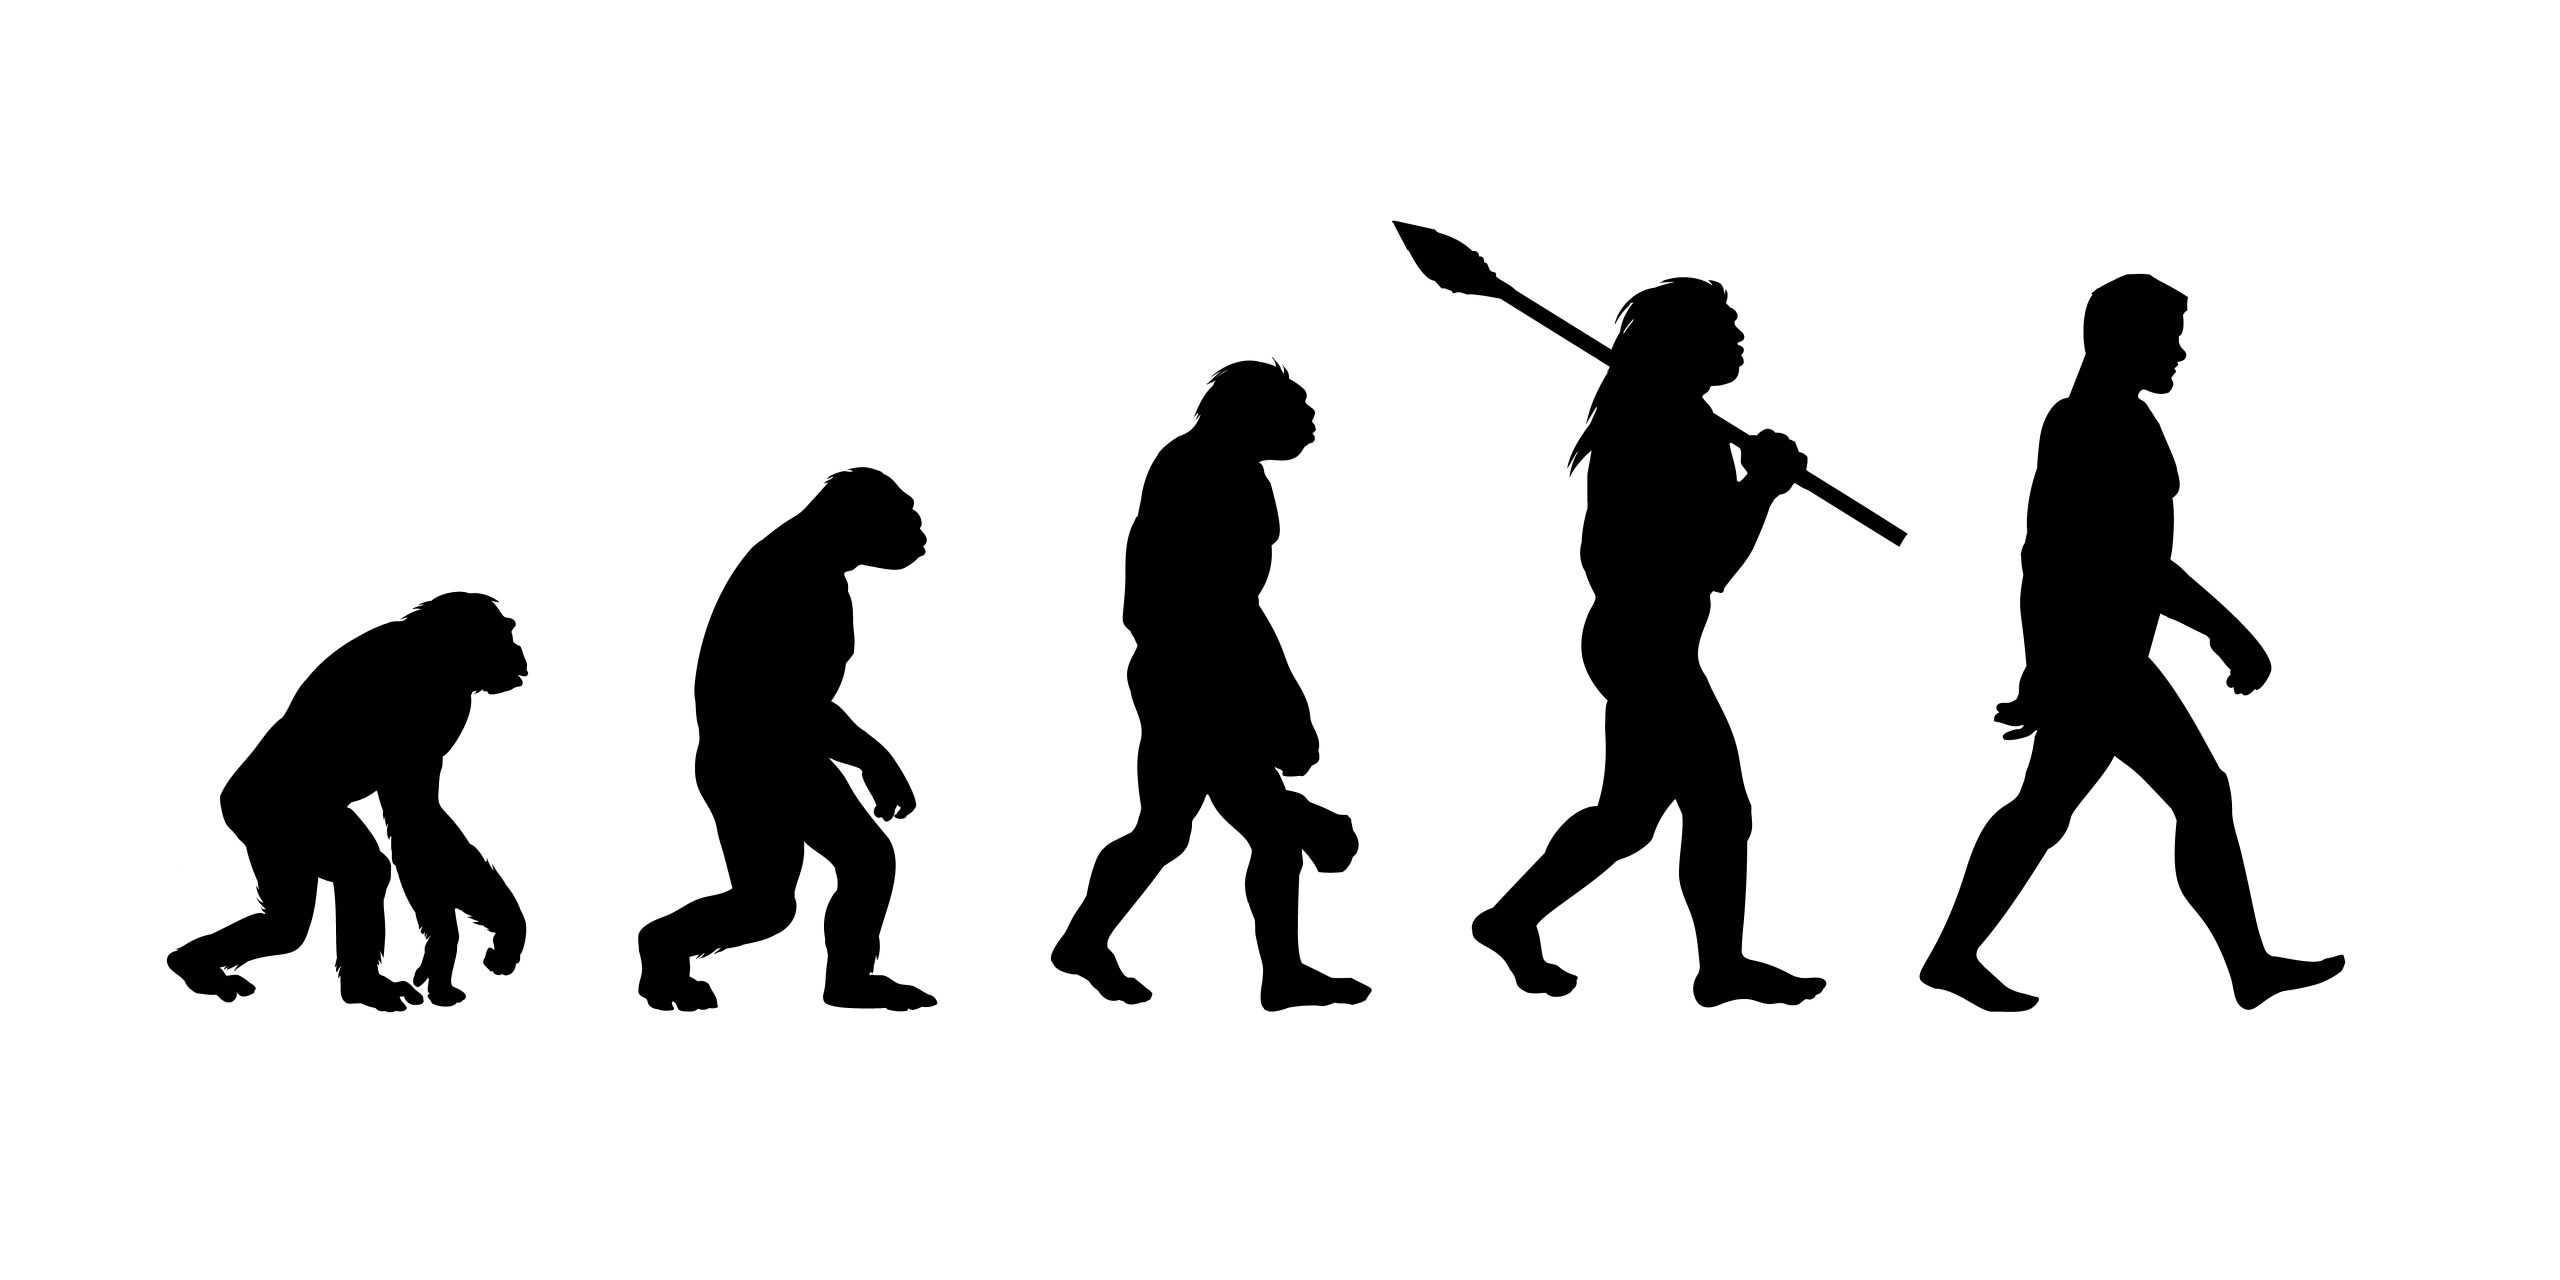 Evolution of Man Silhouette